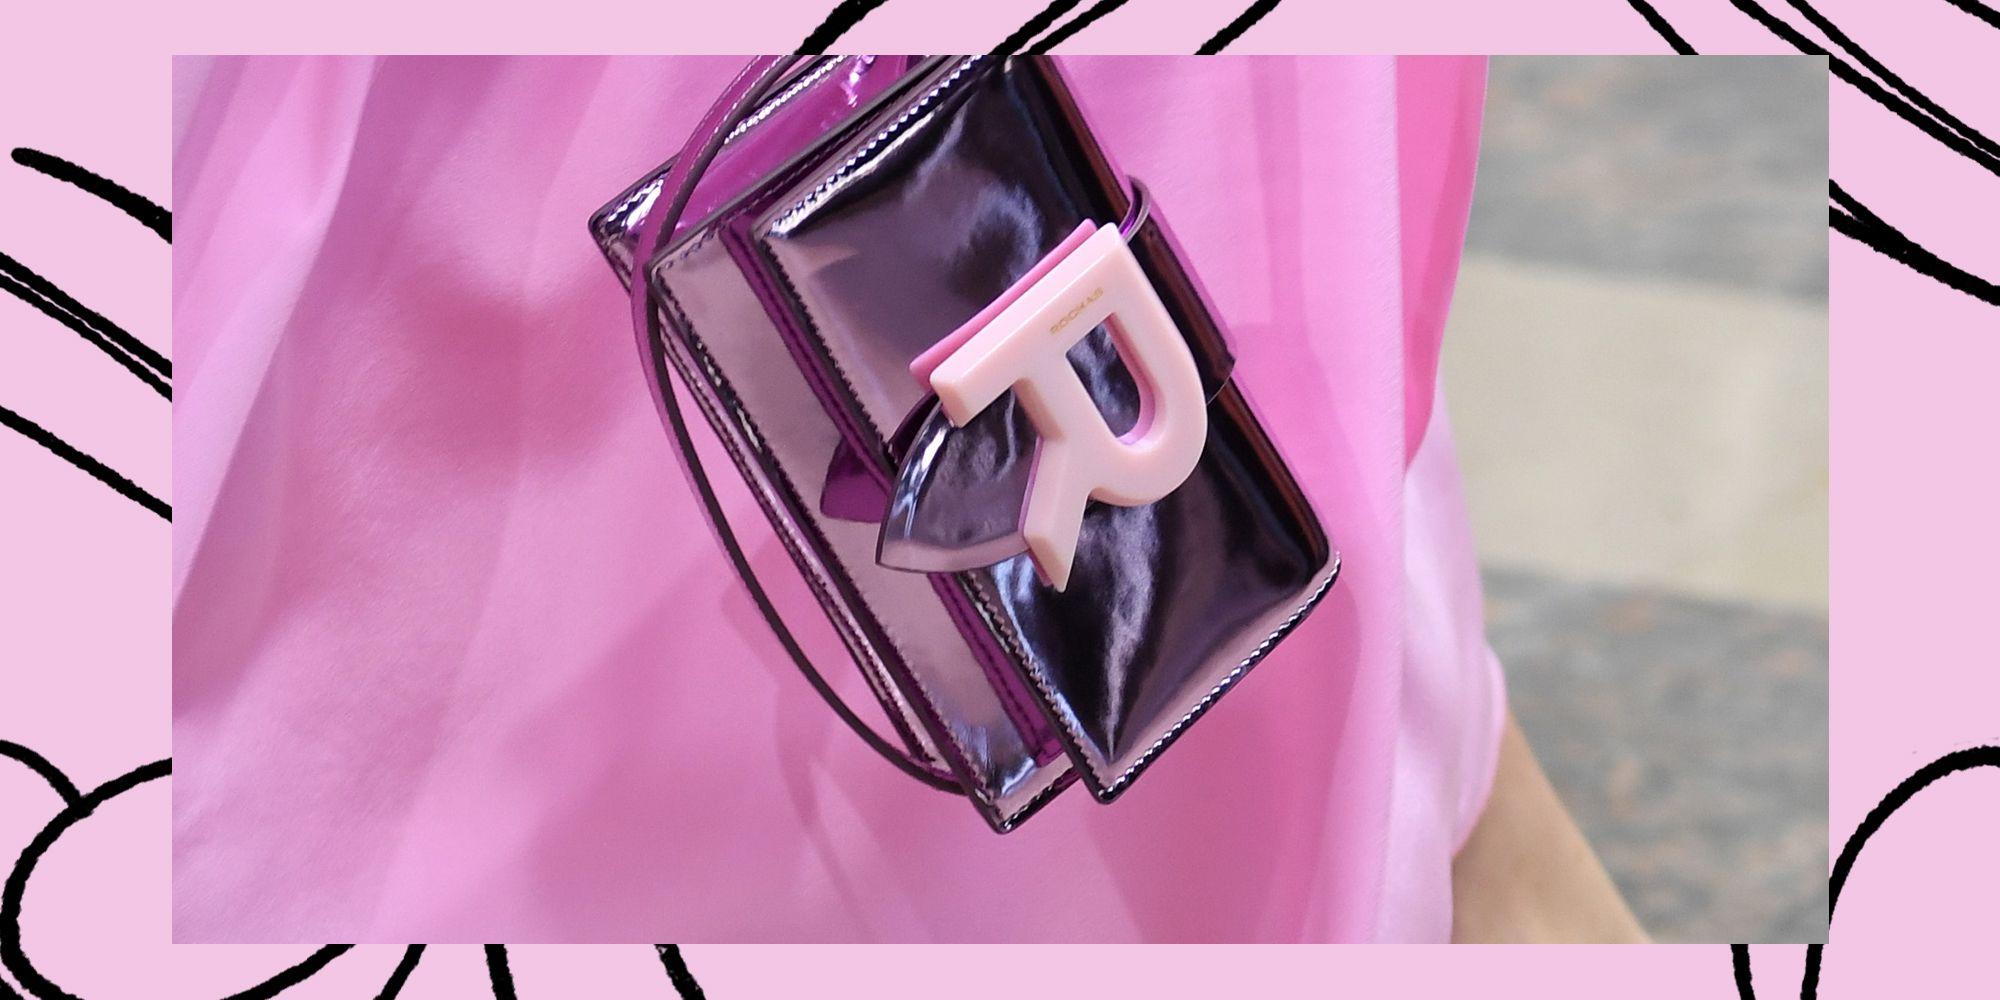 Stylish Things to Personalize , Customized Fashion Gifts